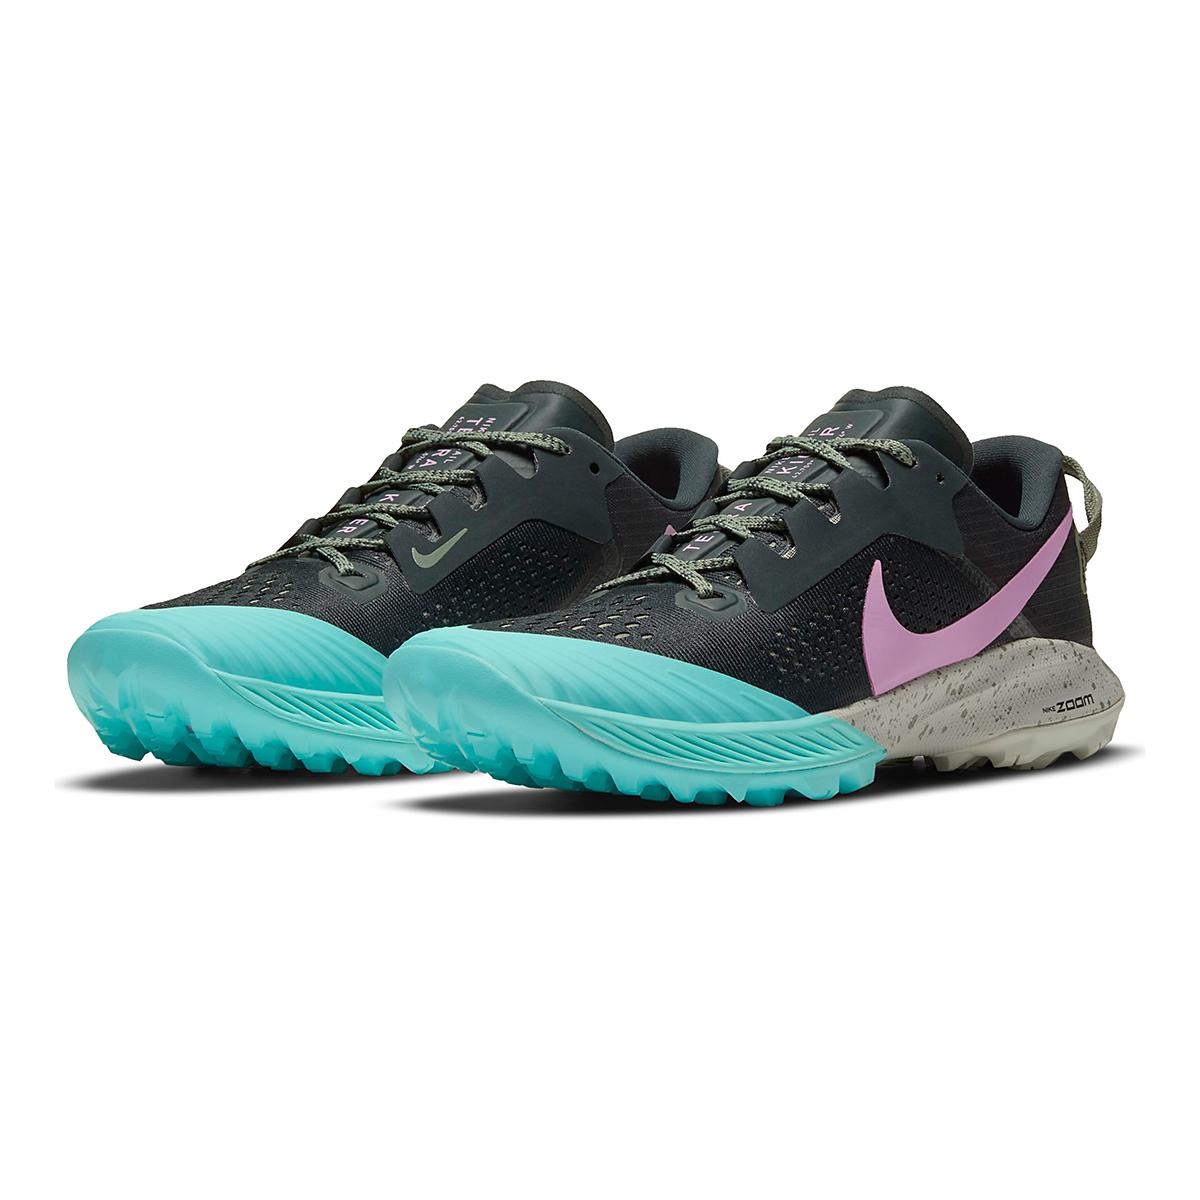 Women's Nike Air Zoom Terra Kiger 6 Trail Running Shoe - Color: Seaweed/Beyond Pink - Size: 5 - Width: Regular, Seaweed/Beyond Pink, large, image 3